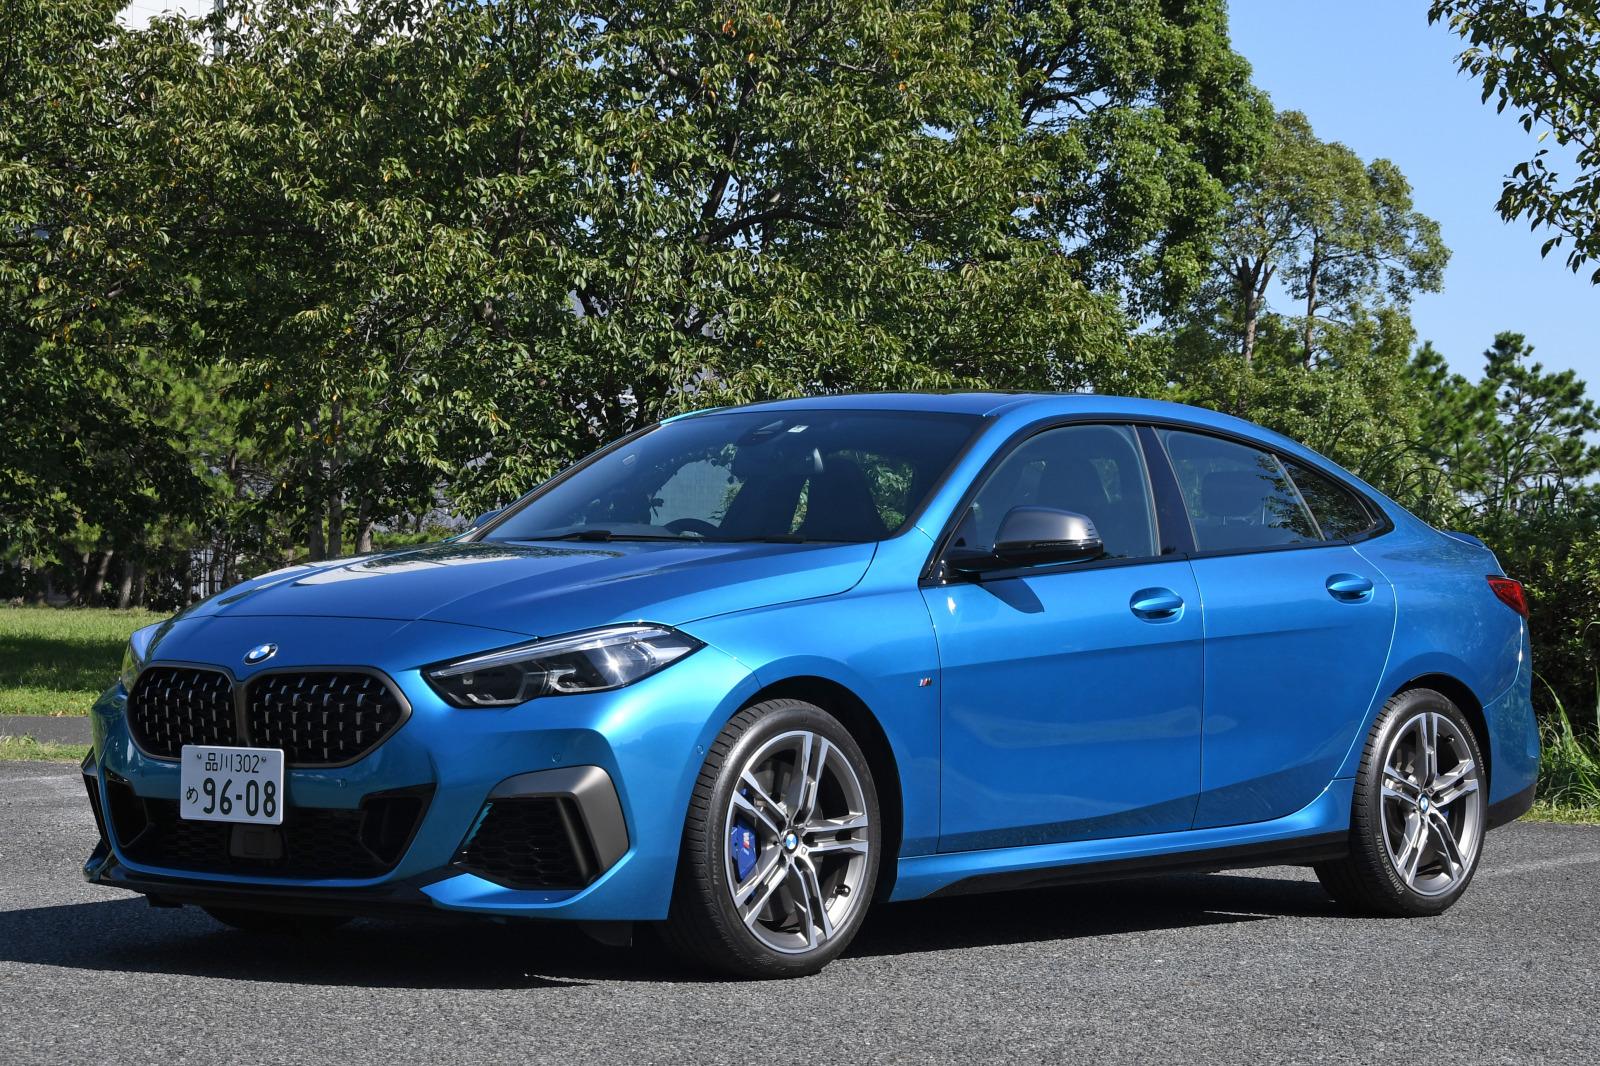 「FFベース4WDの味付けに開眼したBMW 【BMW M235i Xドライブ グランクーペ試乗】」の1枚目の画像